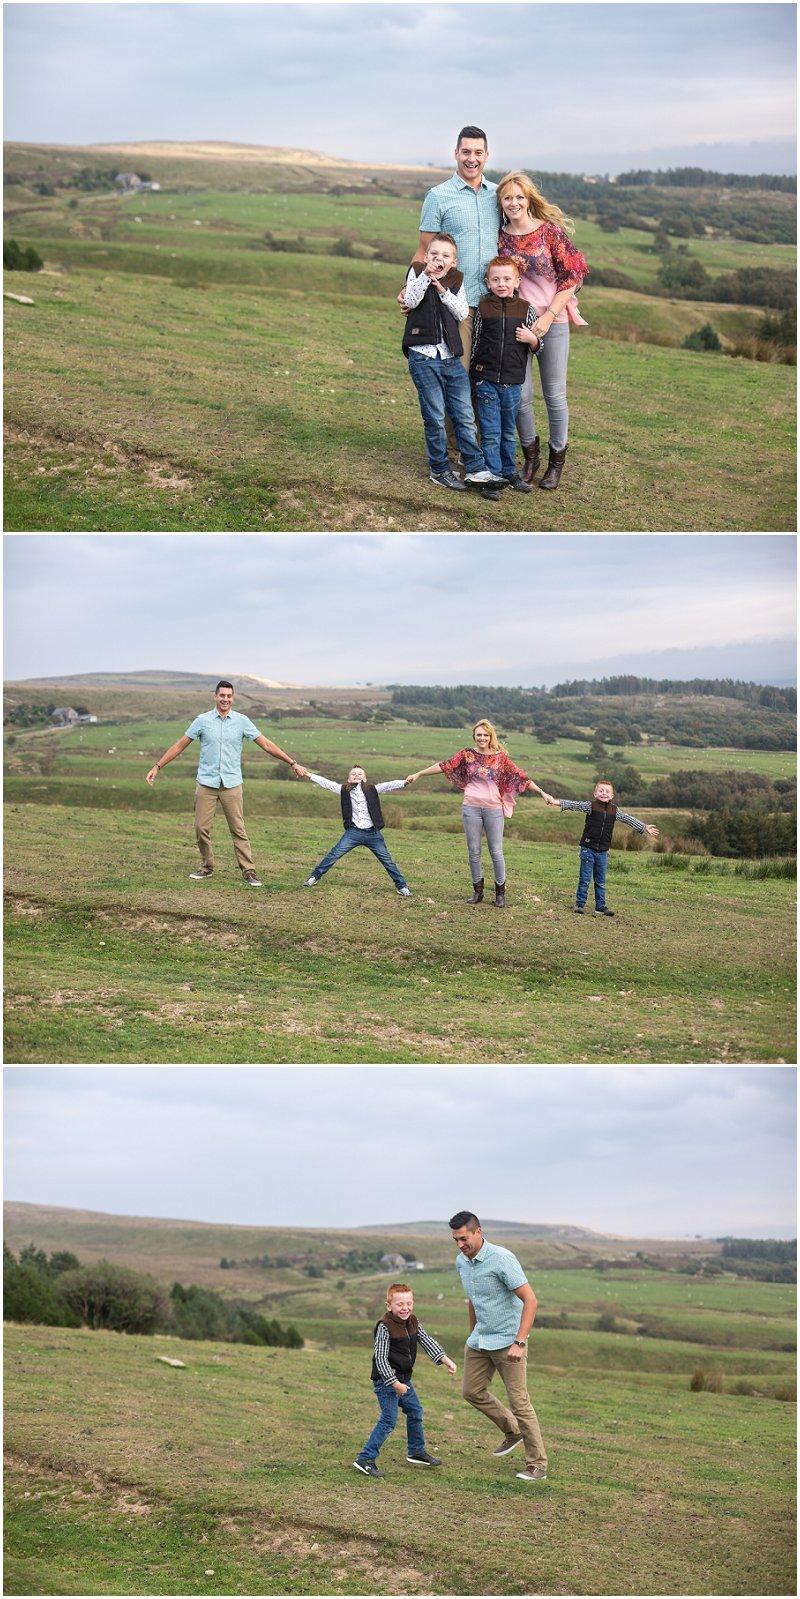 Fun Family Photo Shoot at Rivington Park Lancashire